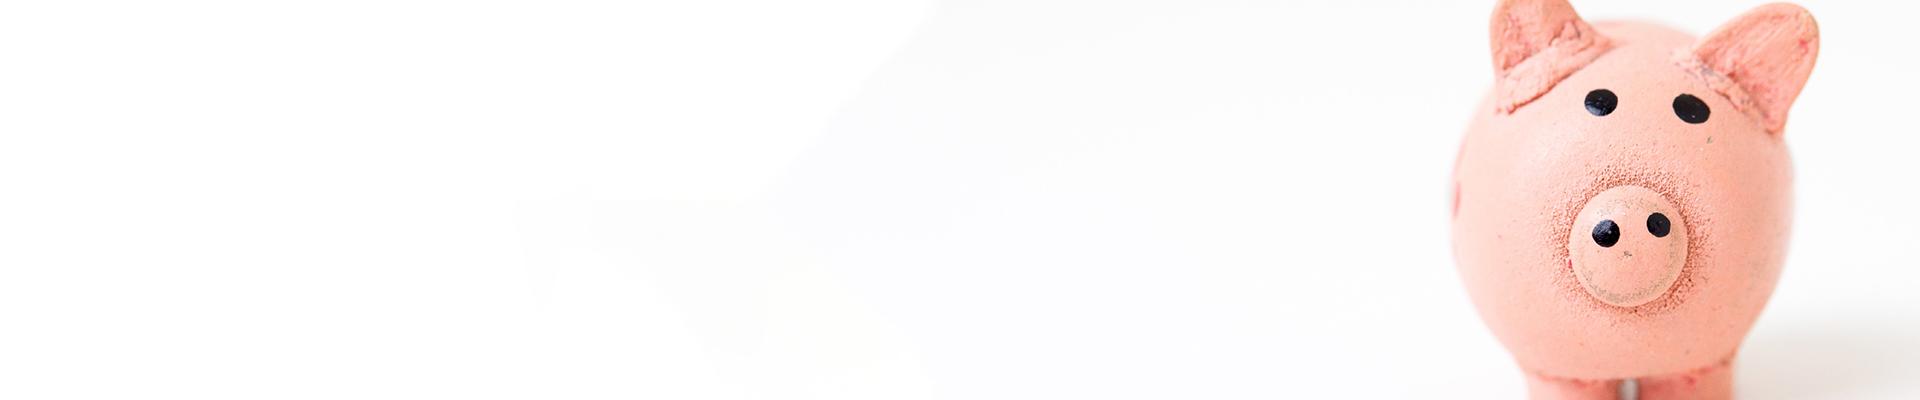 1920x400px_banner_bericht_7